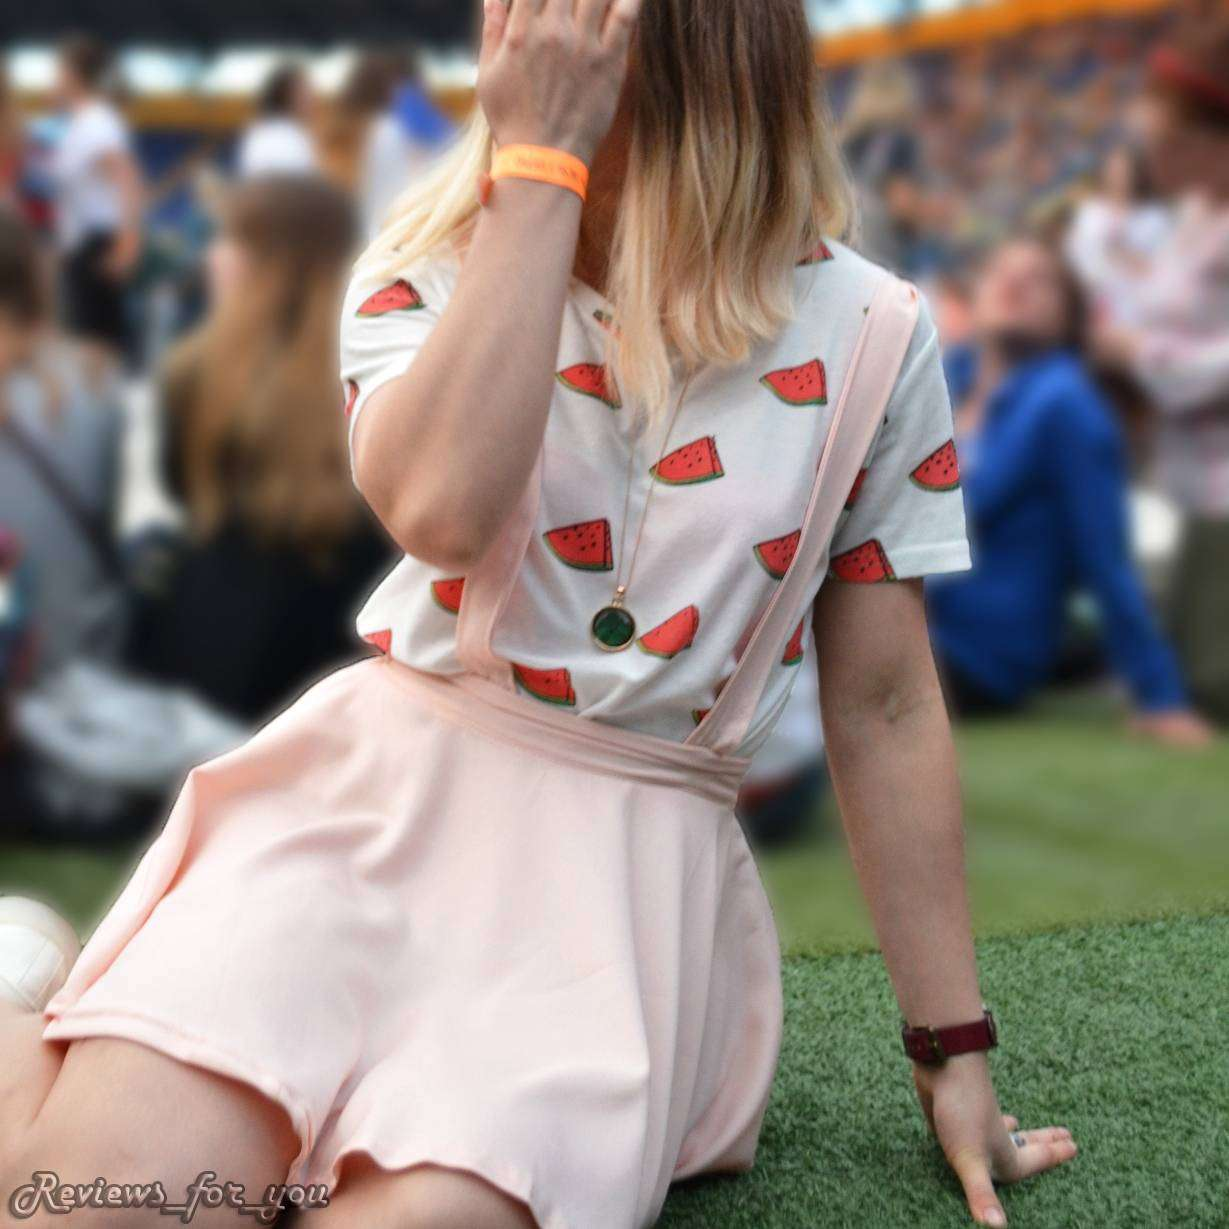 Aliexpress: Женская футболка с арбузиками